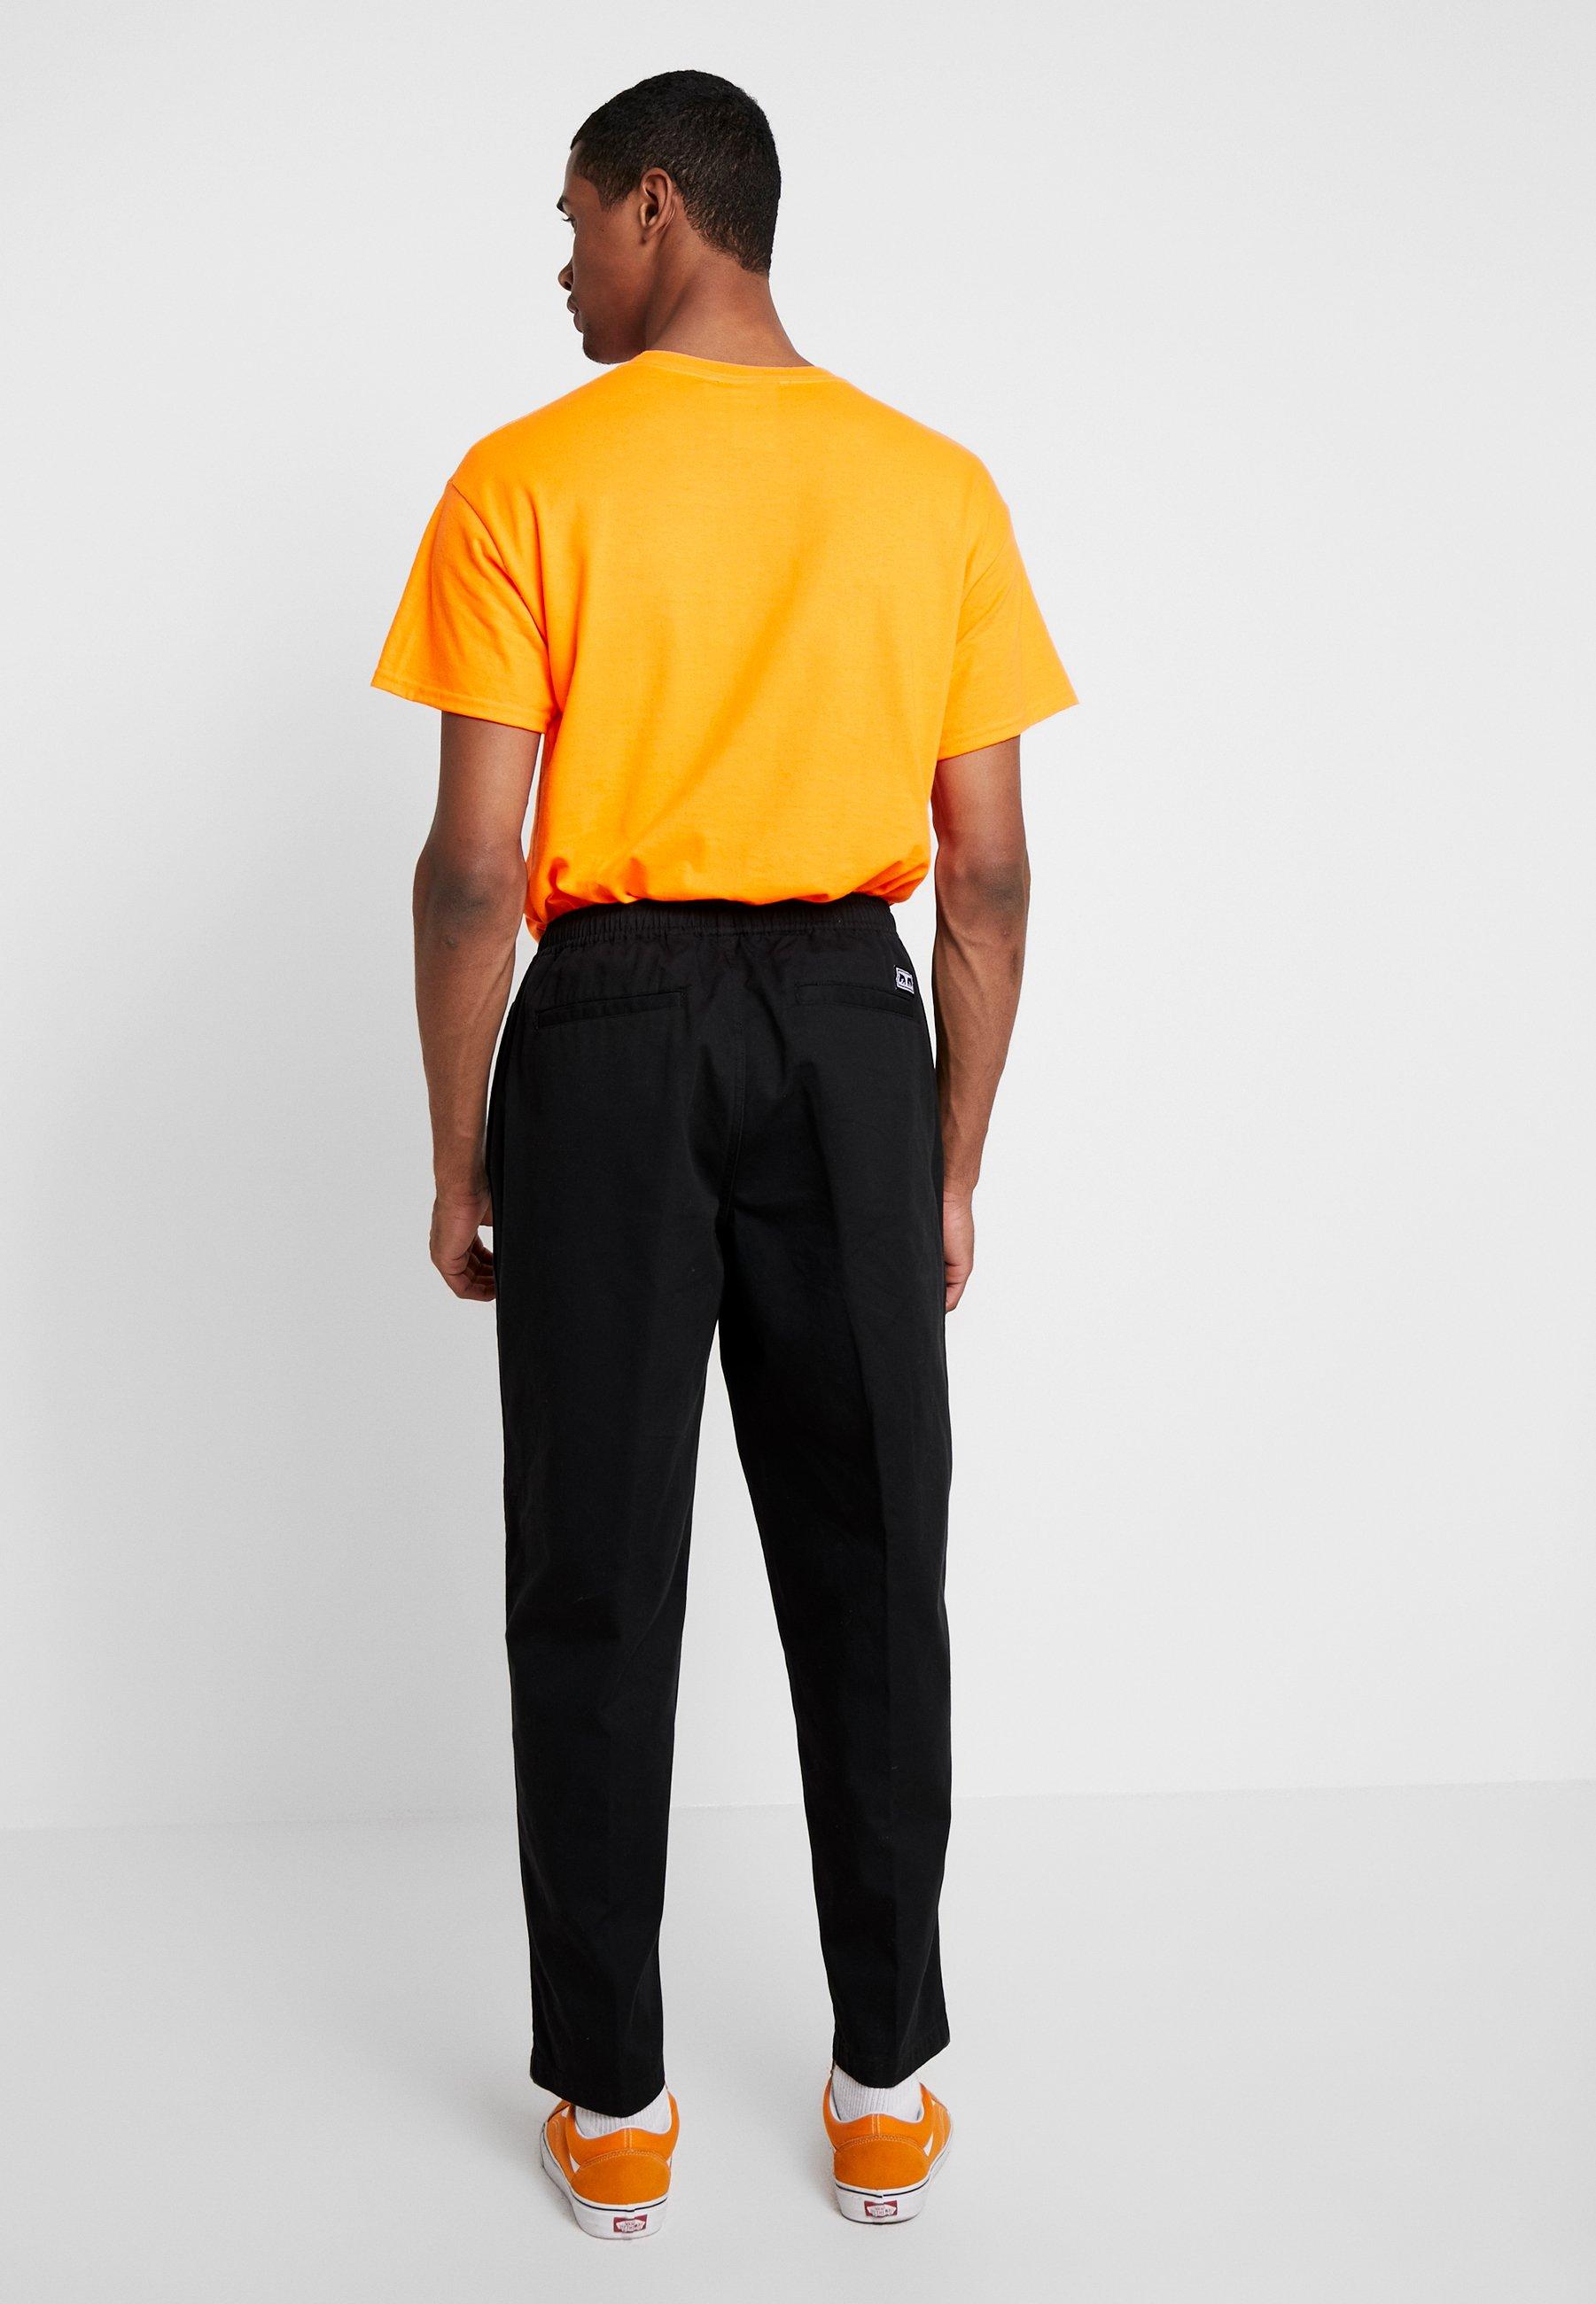 Easy Black Clothing Obey PantPantalon Classique fgb7y6